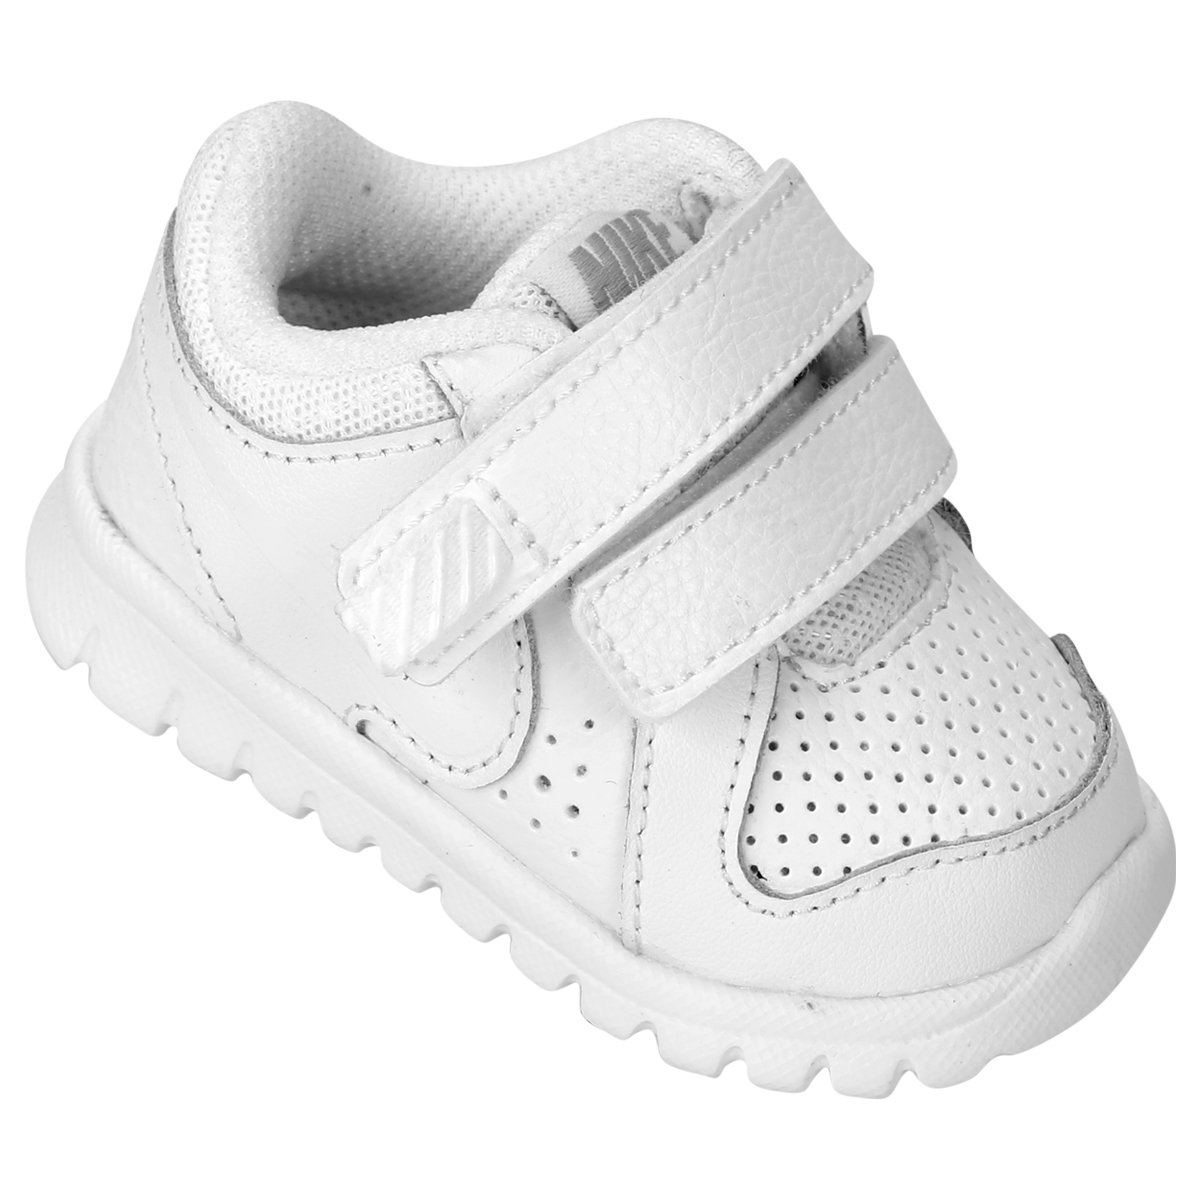 dd586f606fa Tênis Nike Flex Experience Ltr Infantil - Branco - Compre Agora ...